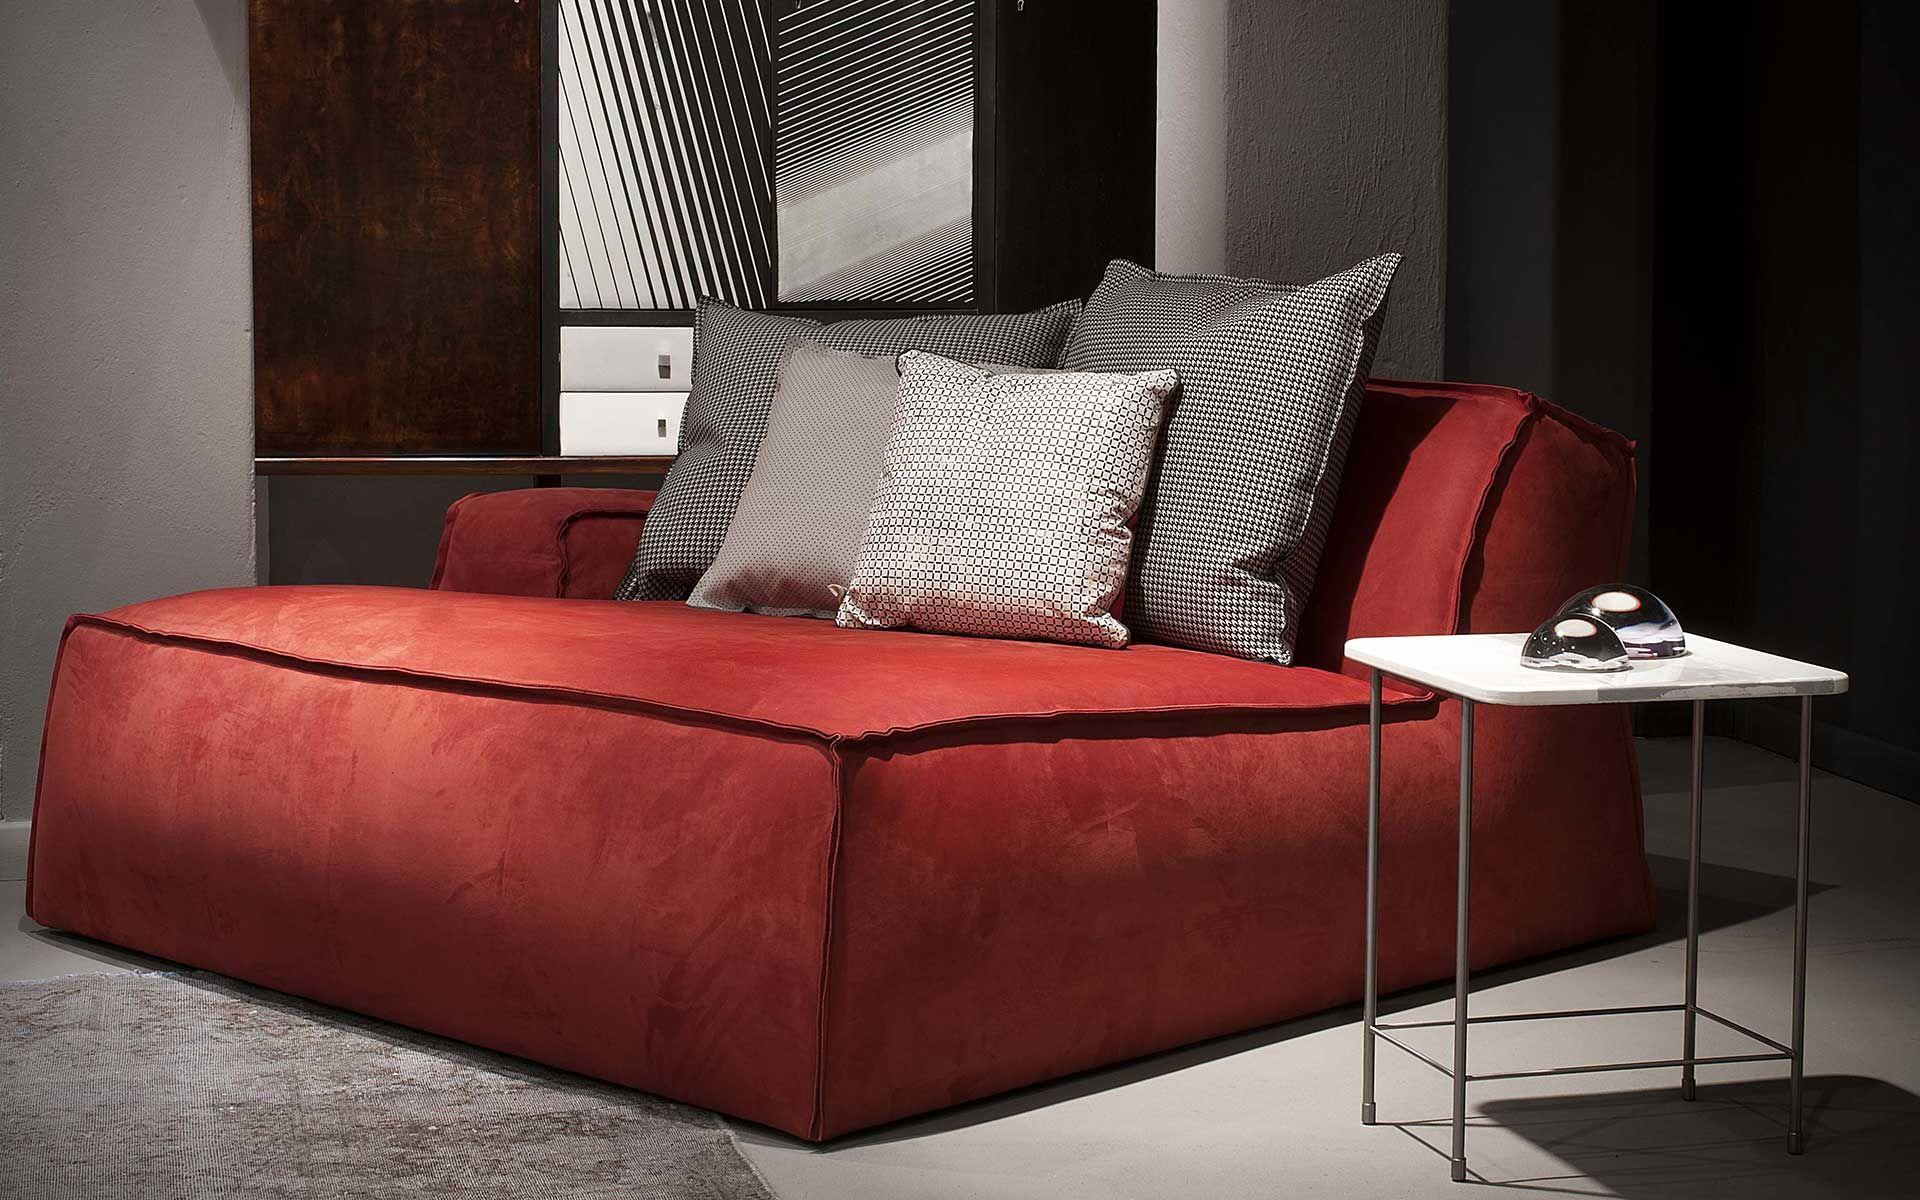 Damasco baxter mo pinterest modernes sofa sofa for Damasco baxter